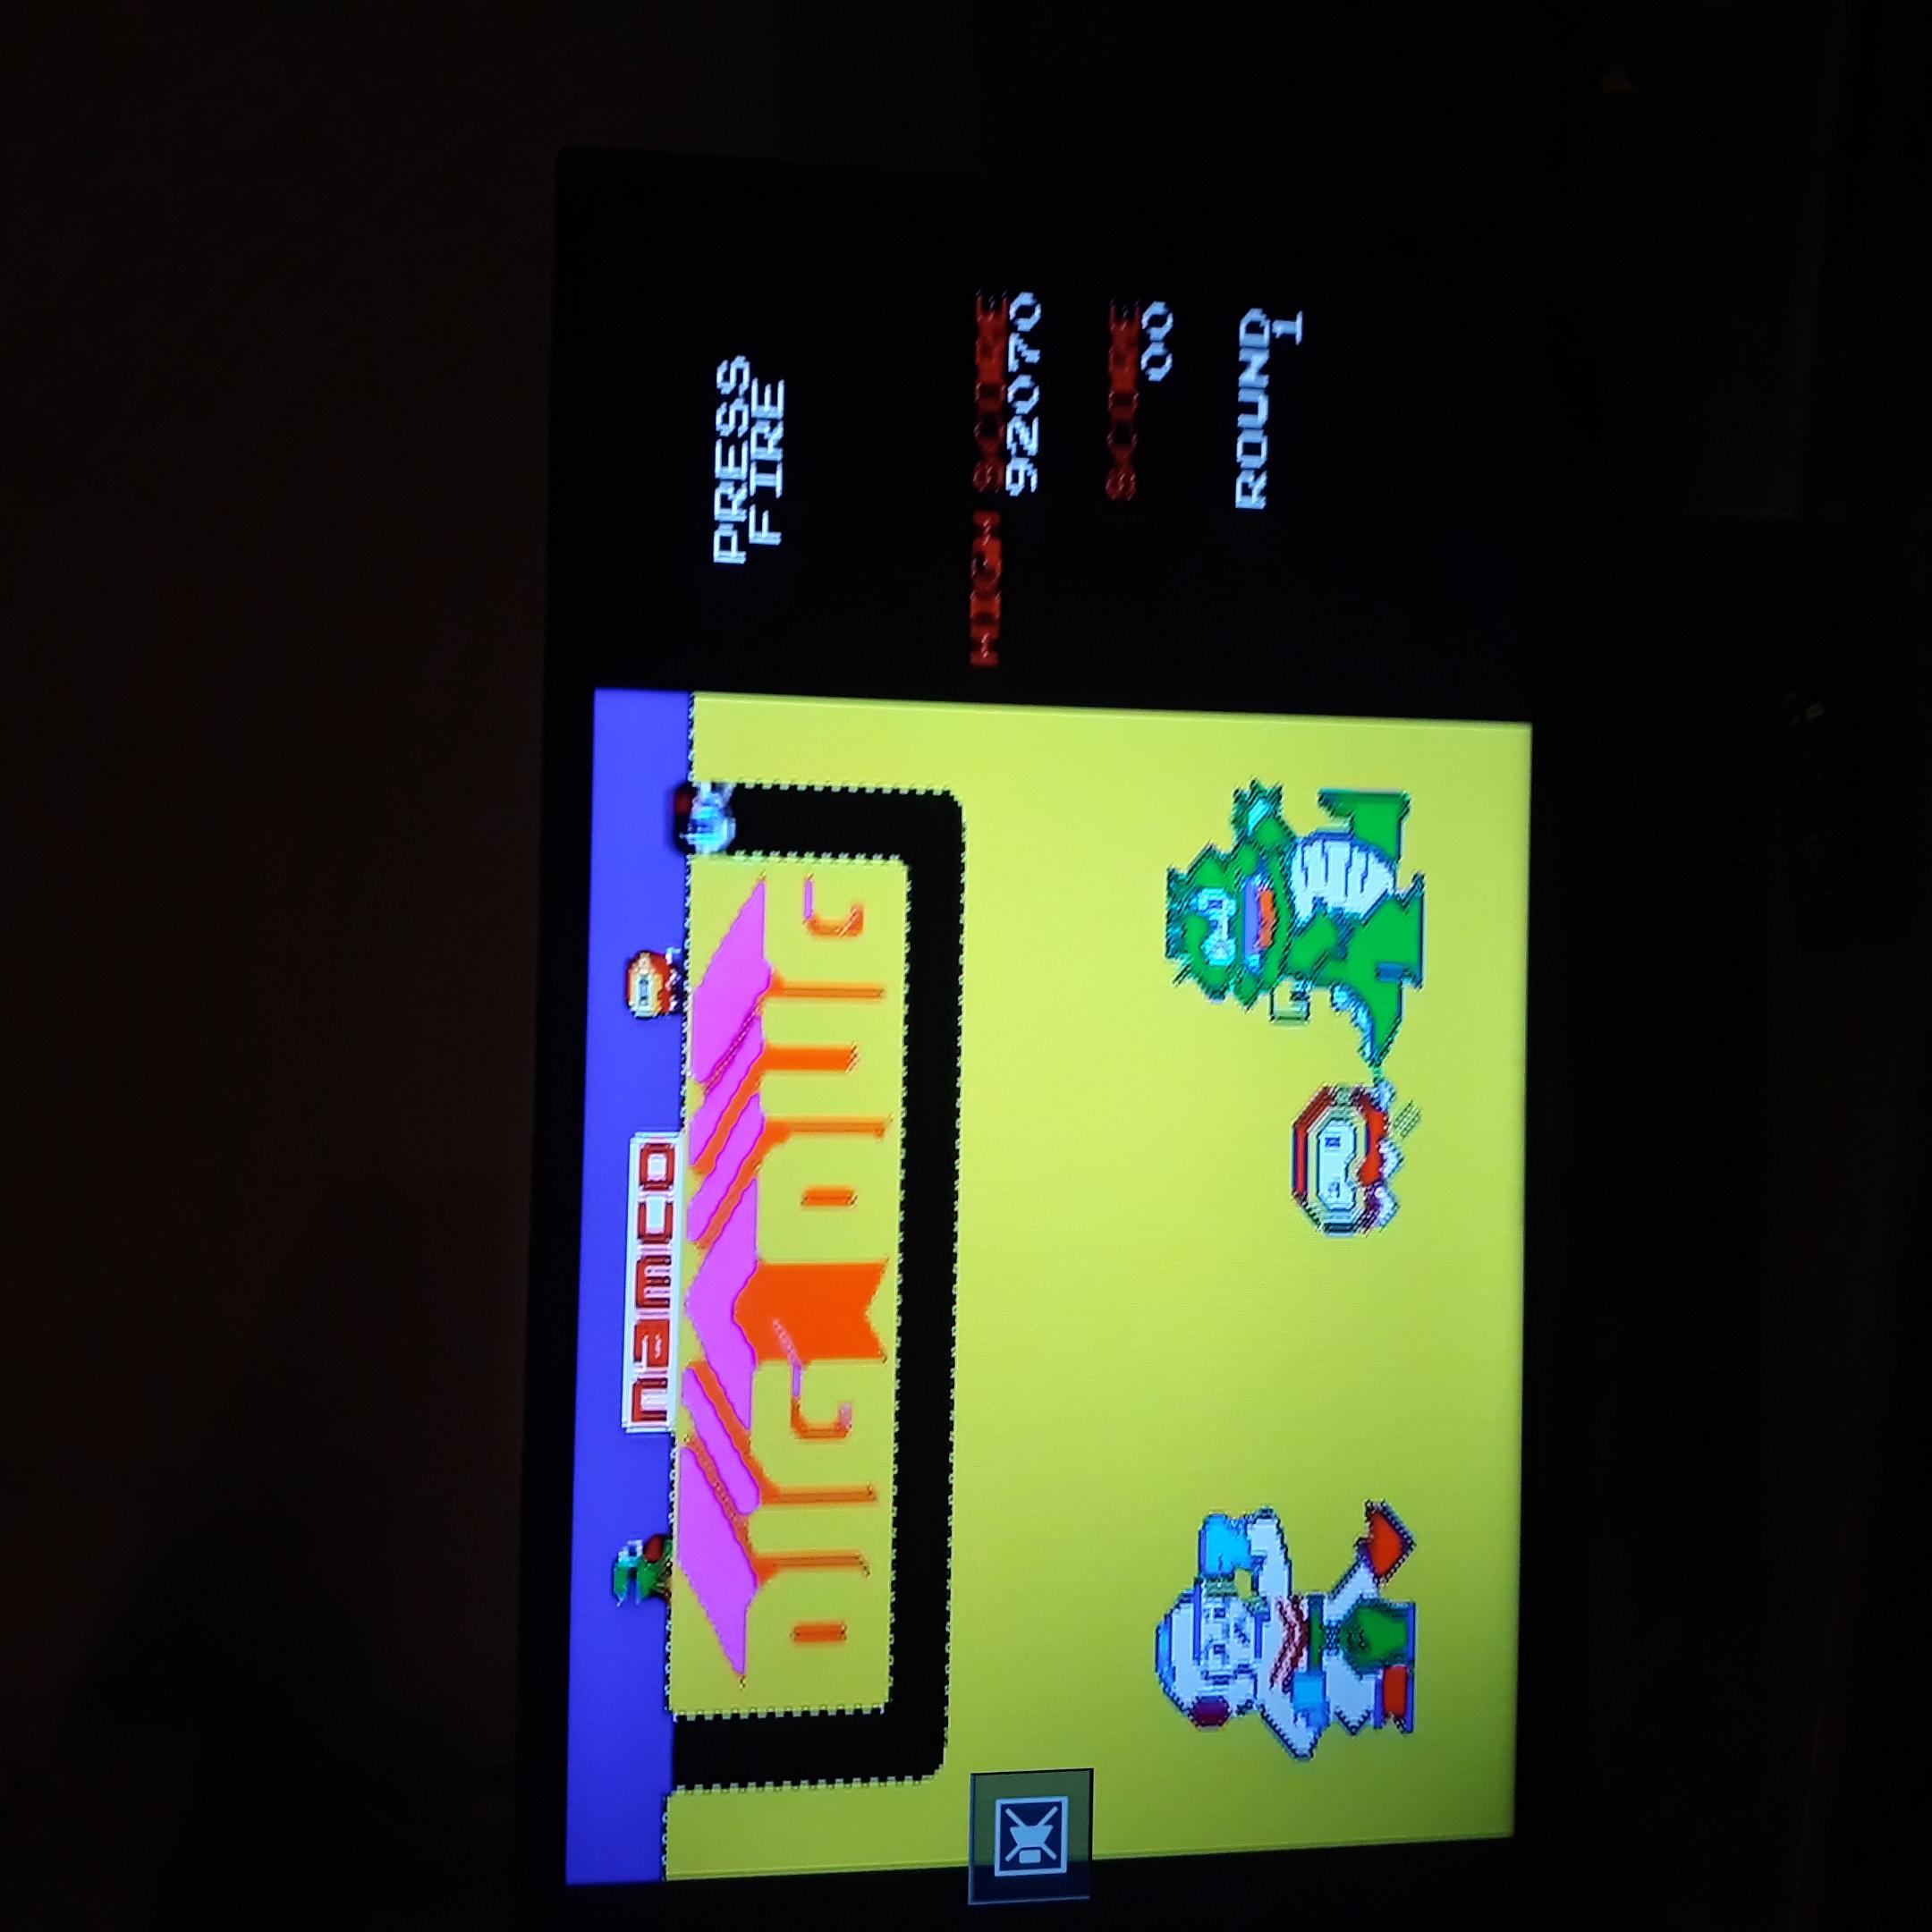 DIM: Dig Dug (Jakks Pacific Retro Arcade Pac-Man) 104,560 points on 2020-07-10 00:25:43